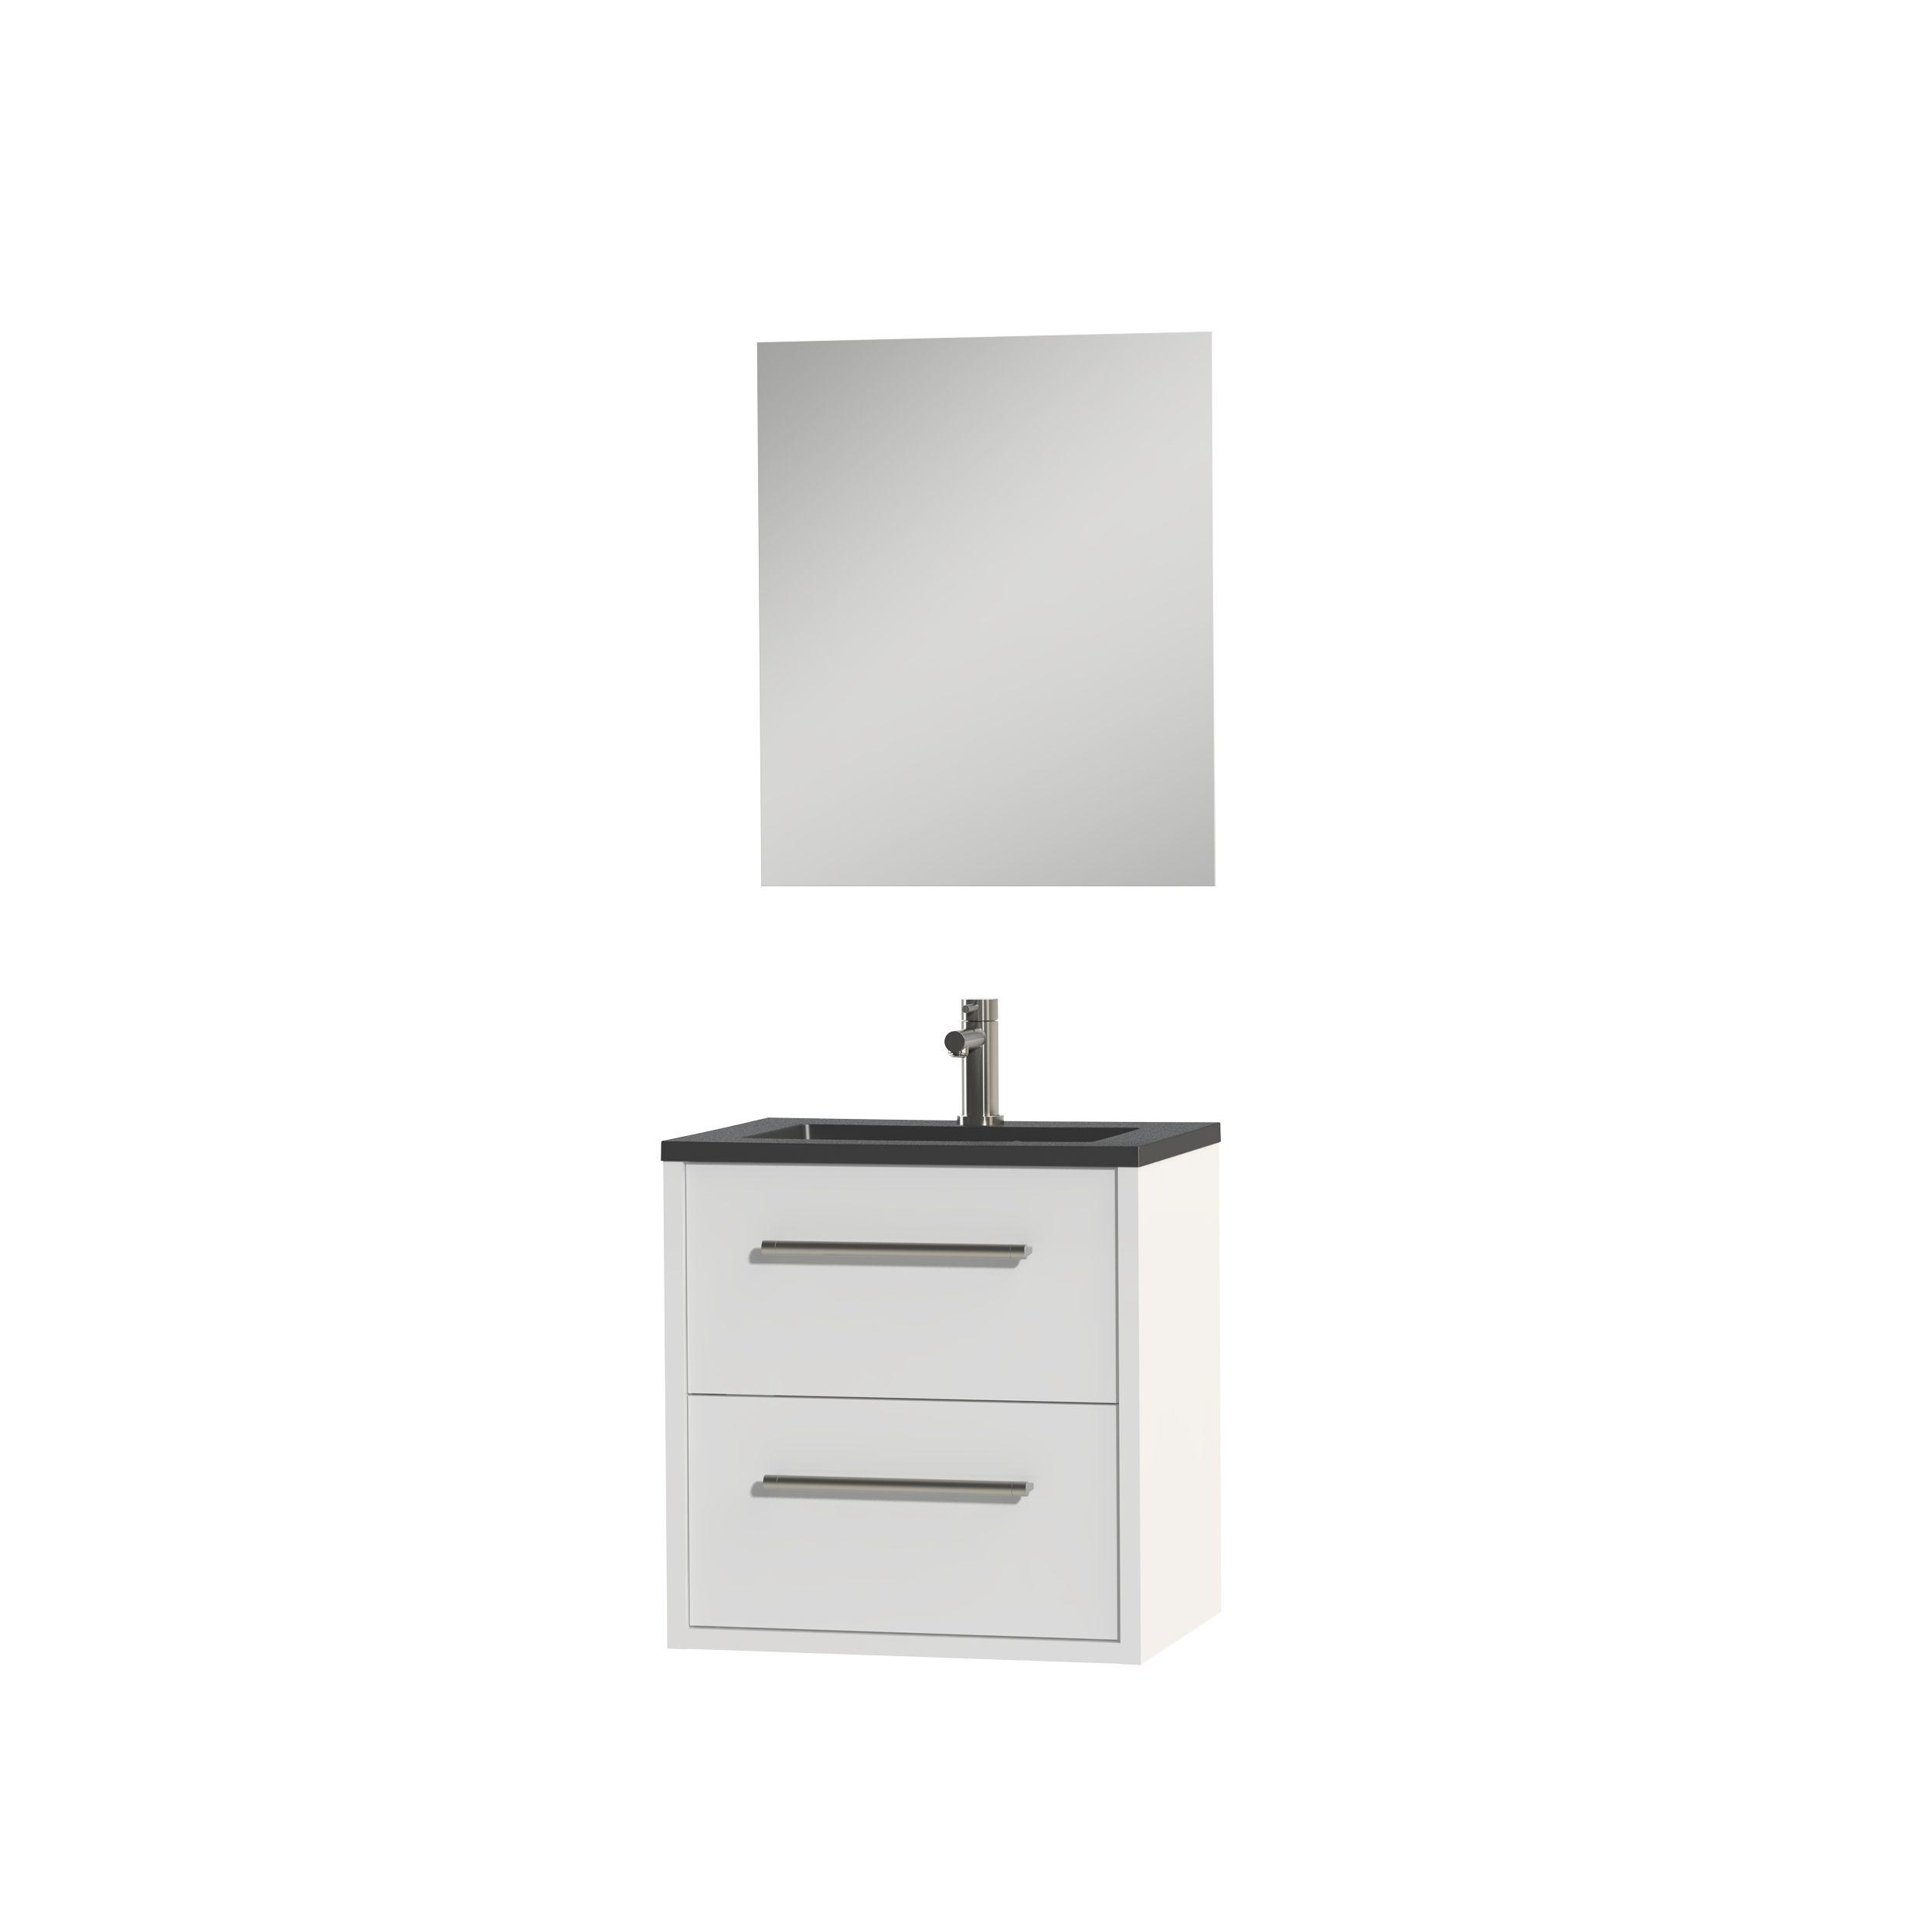 Tiger Boston badmeubelset incl spiegel en zwarte wastafel 60cm wit